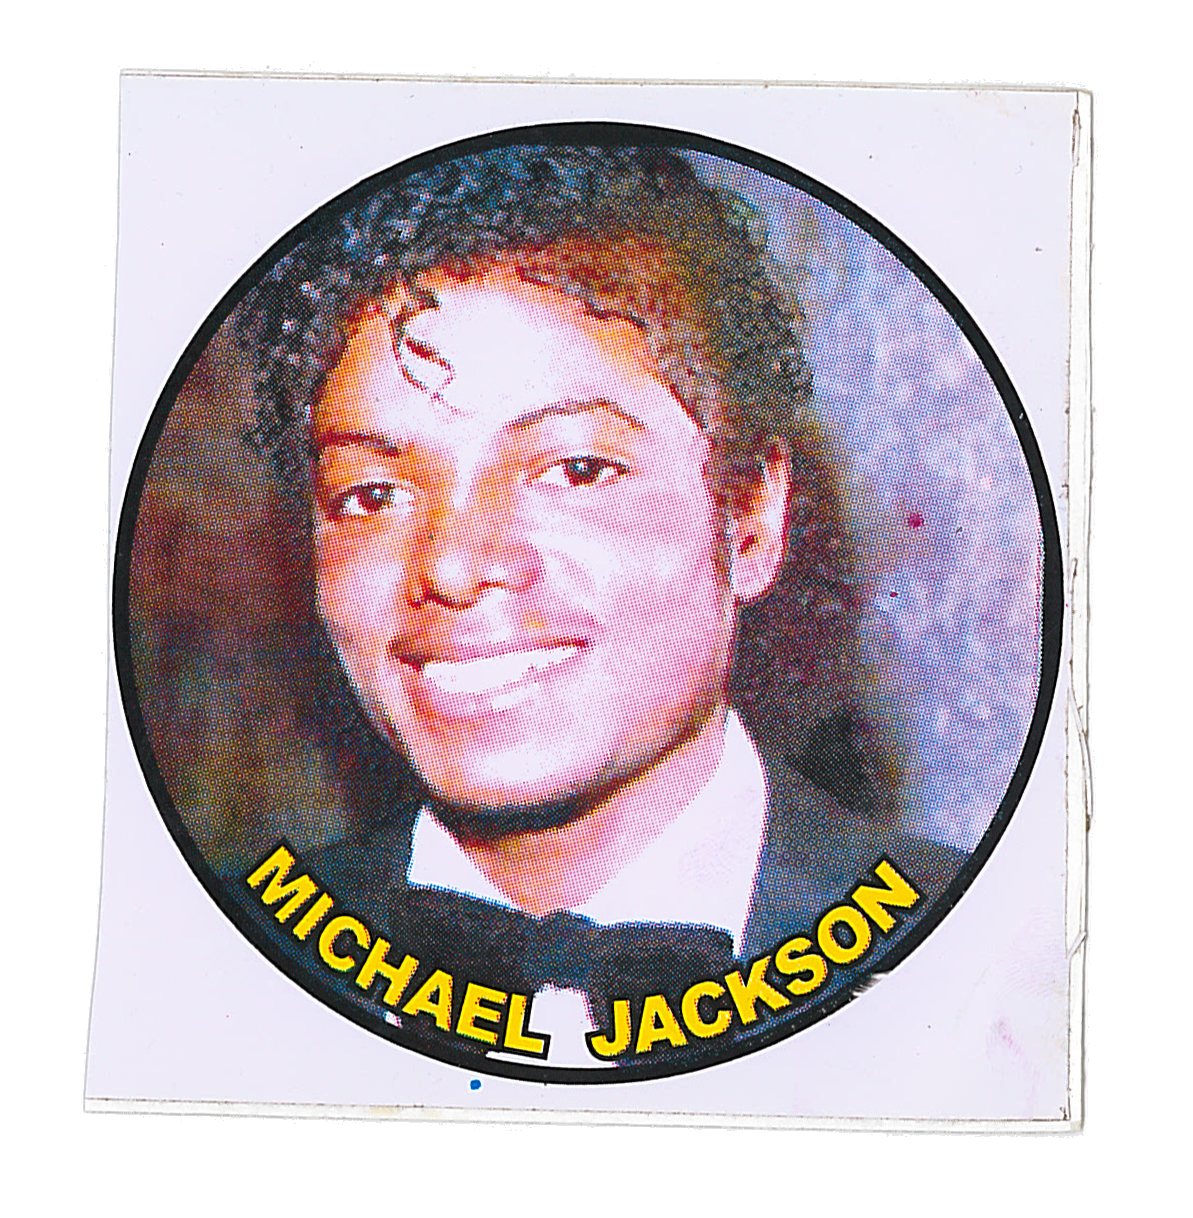 michael-jackson.png